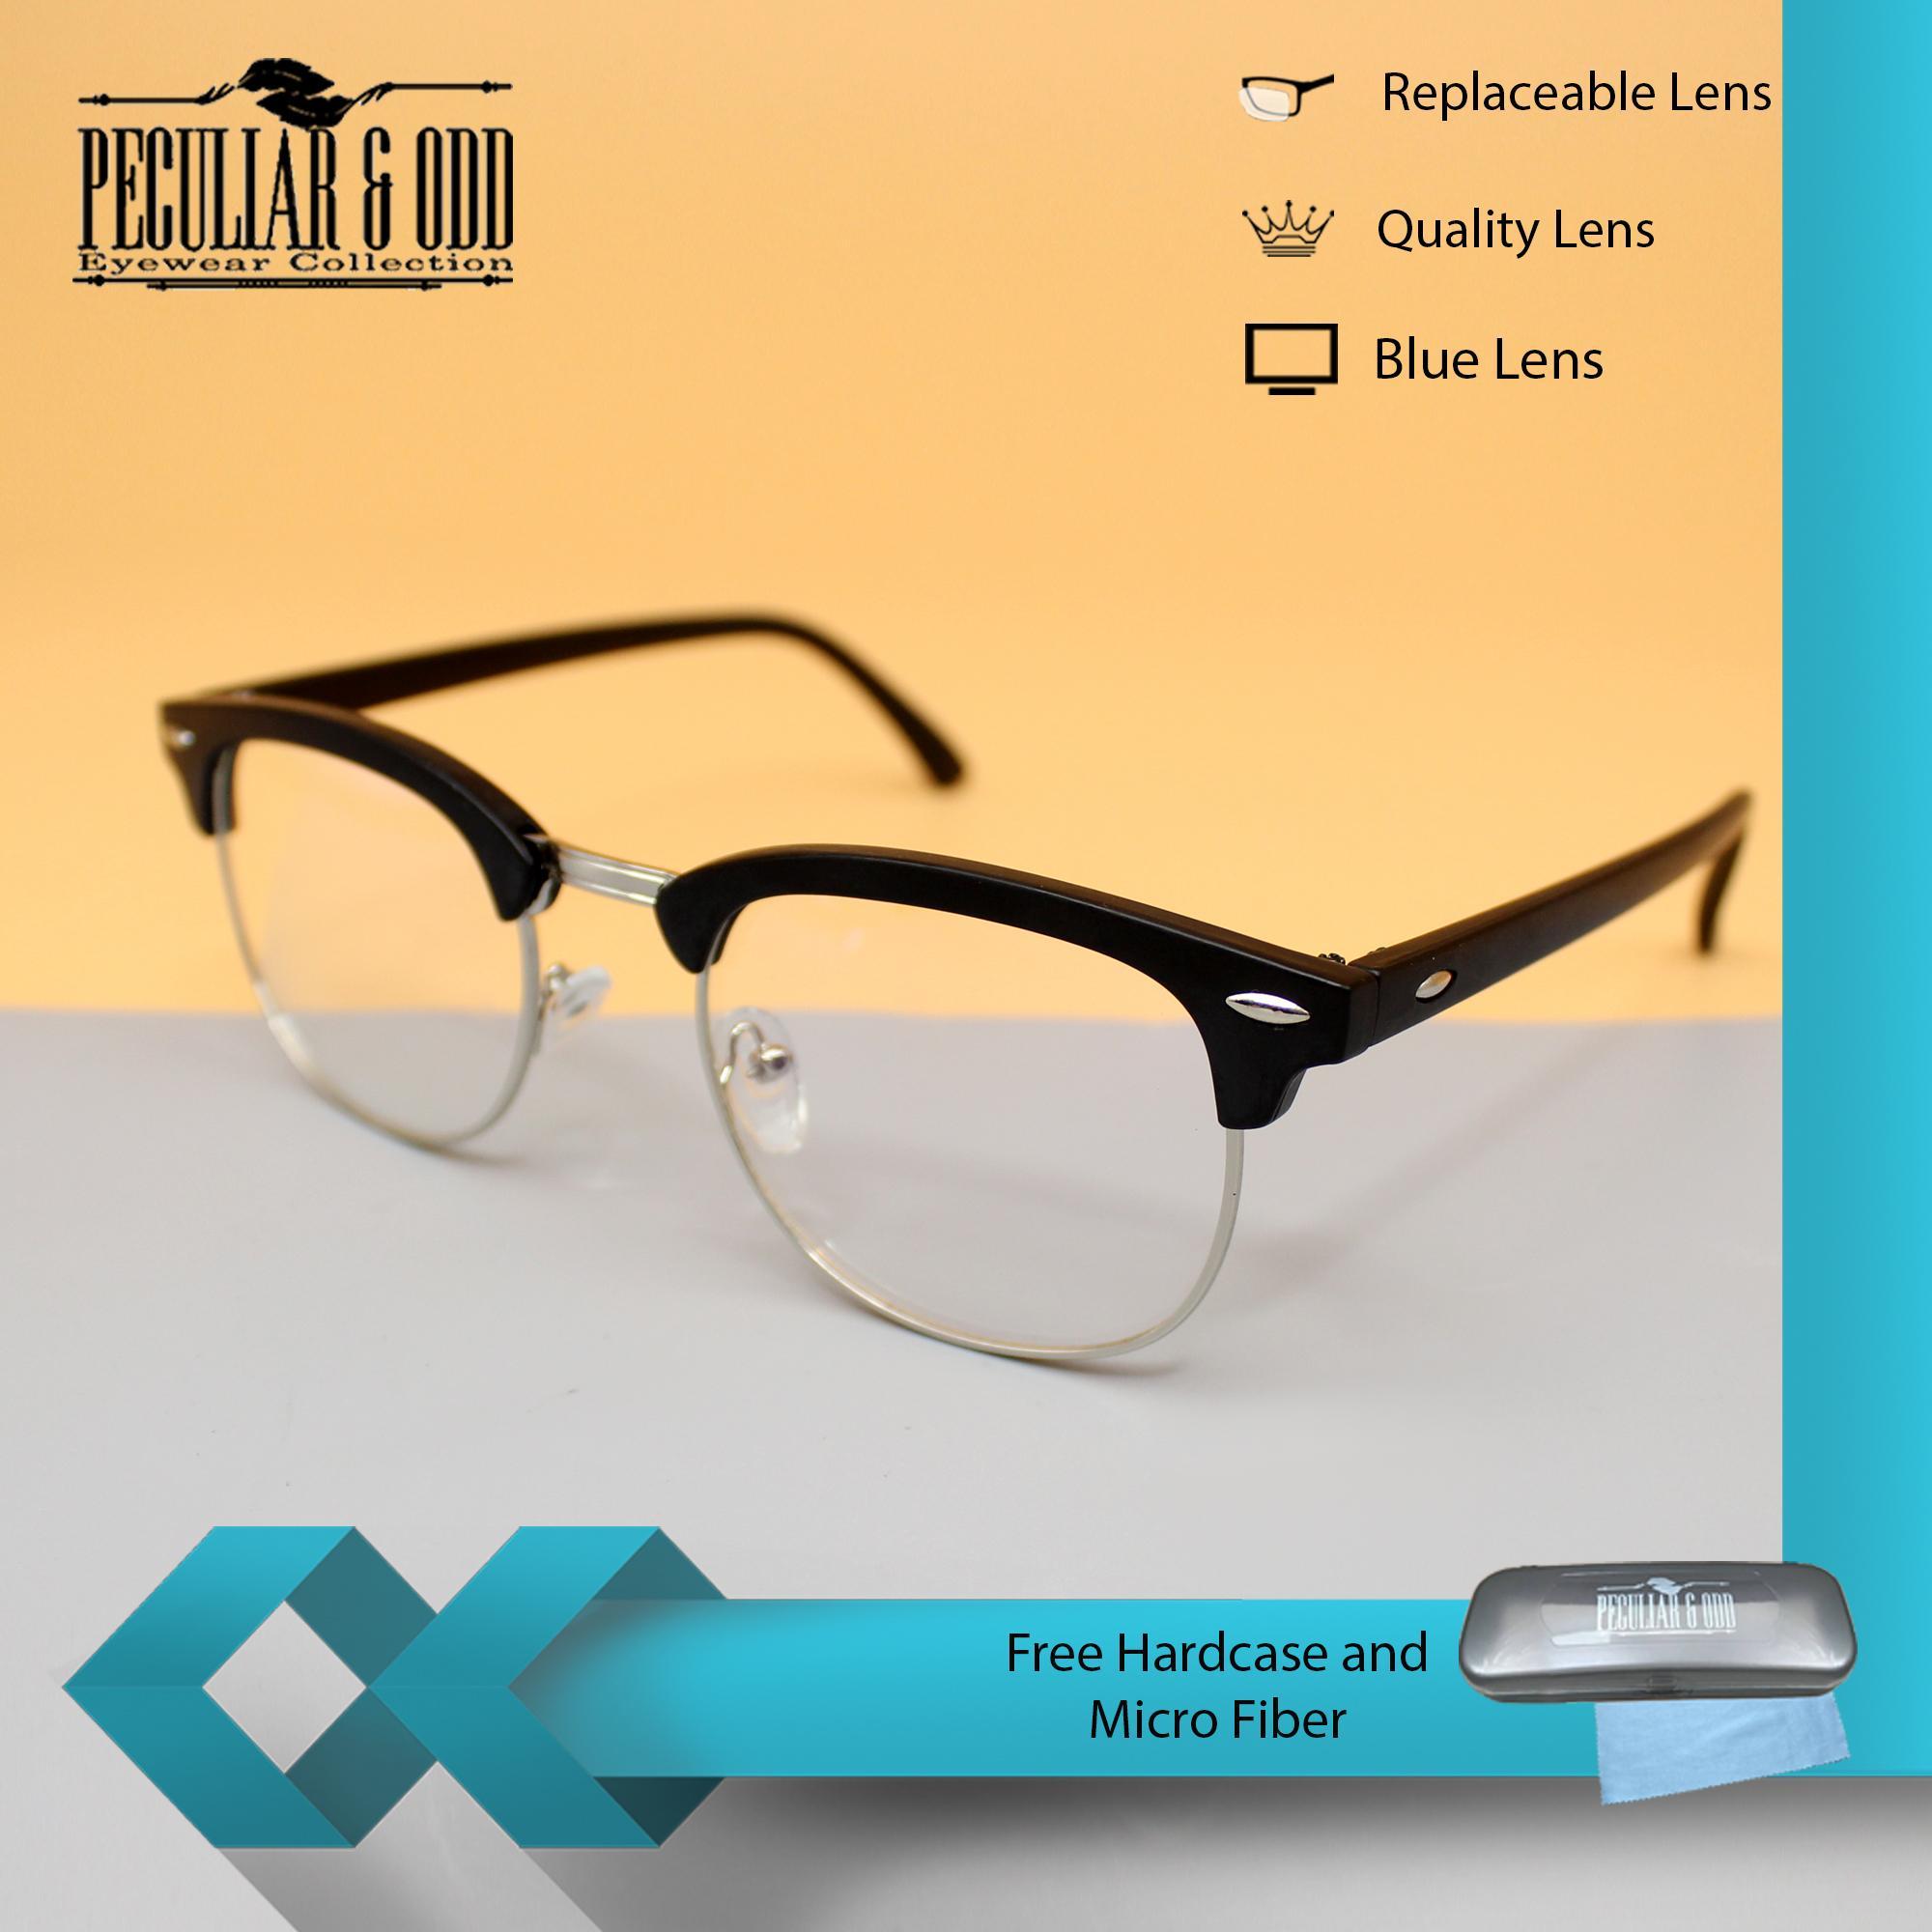 Eyeglasses For Men for sale - Mens Eyeglasses online brands, prices ...